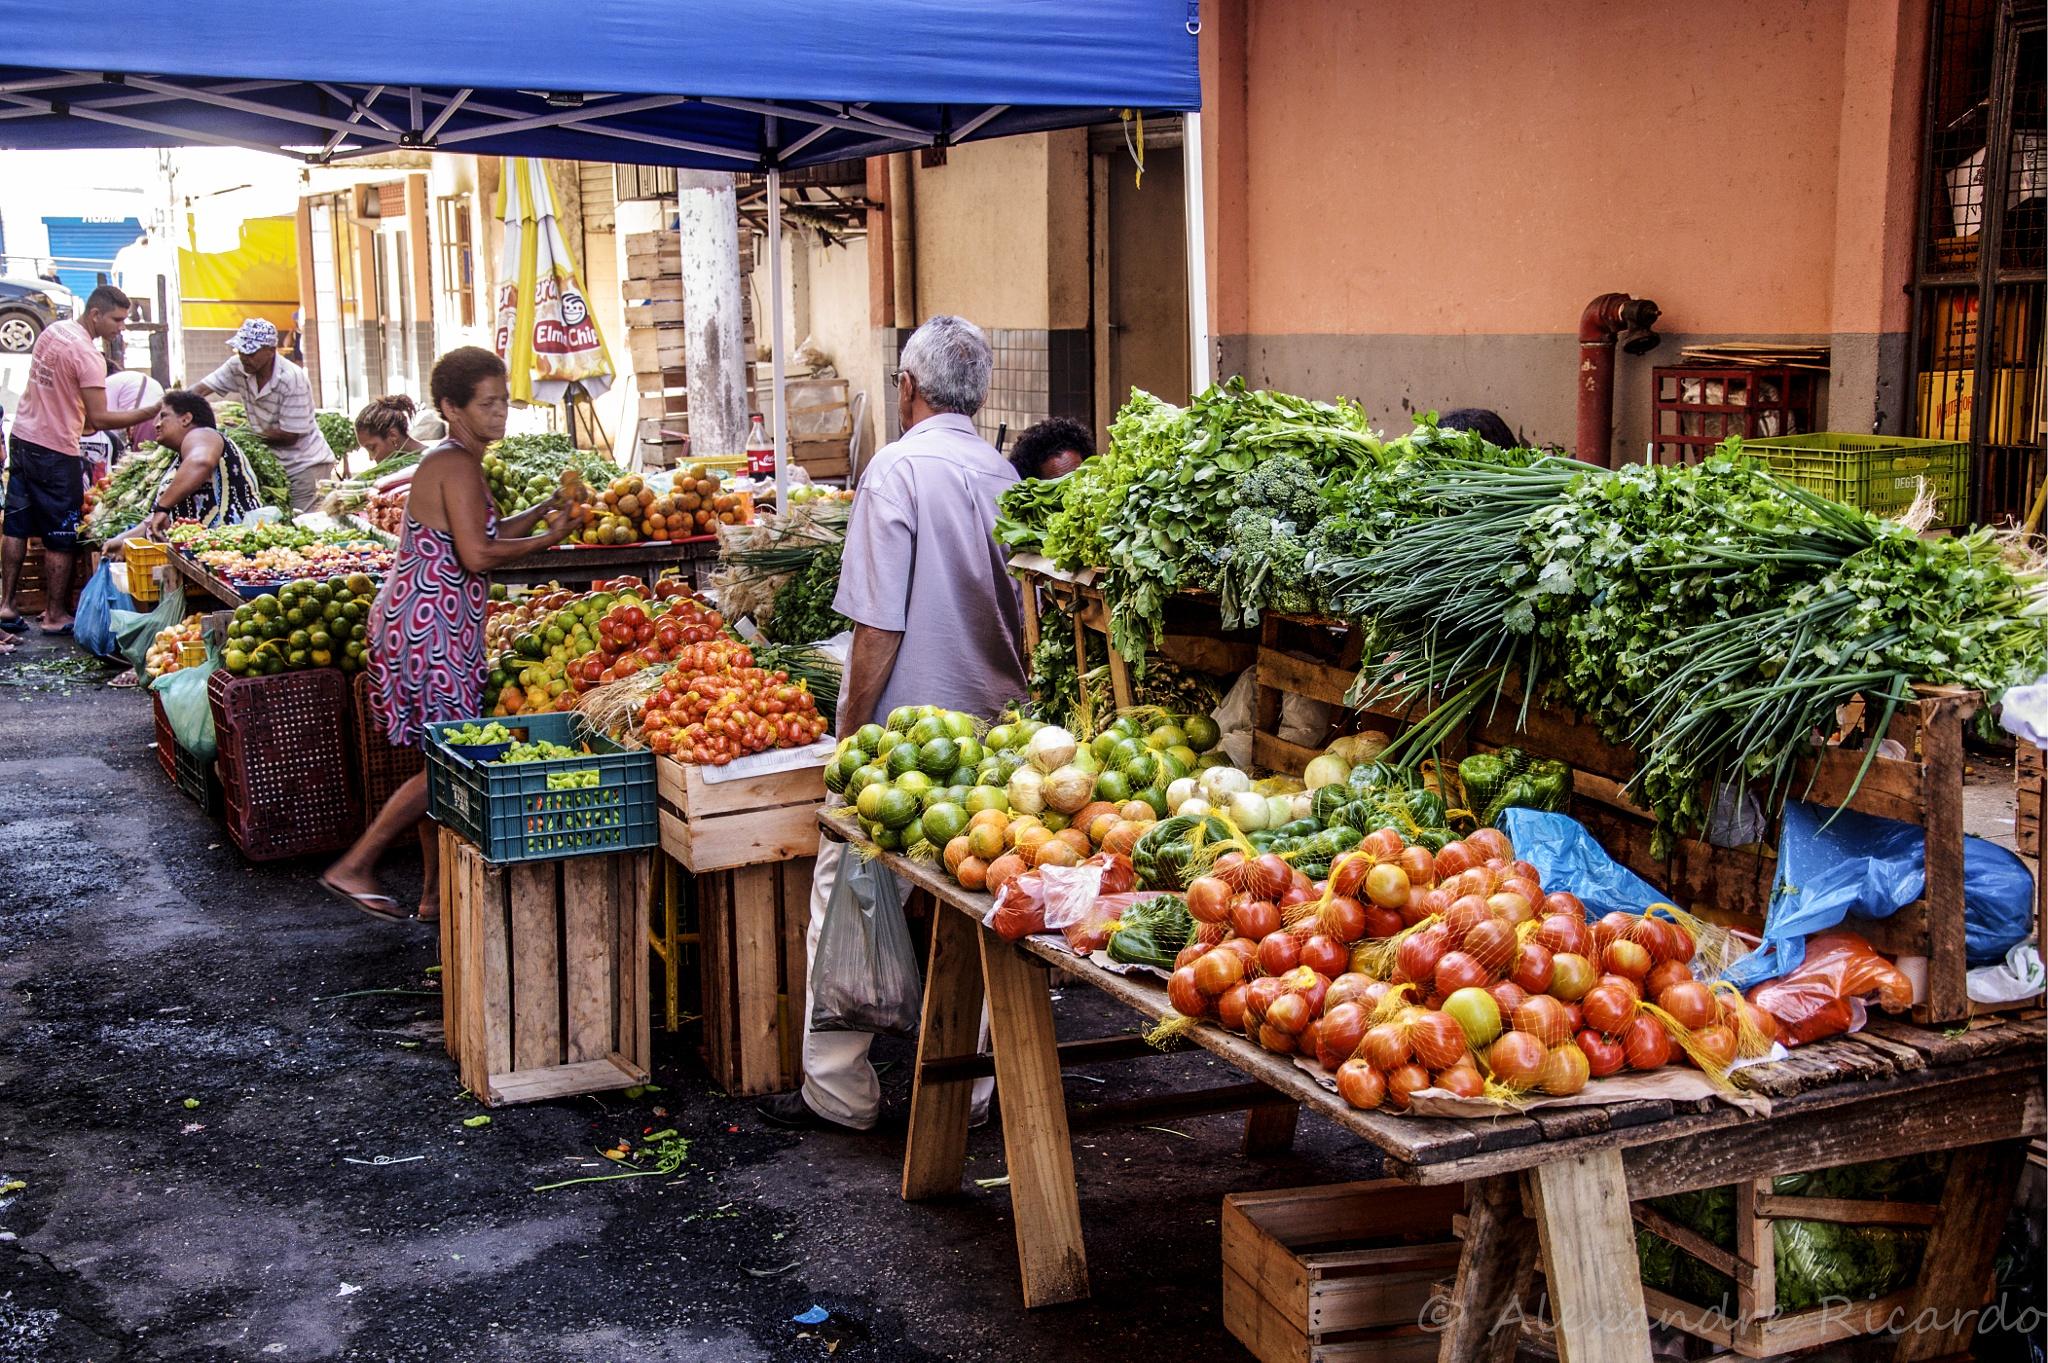 Mercado Vila Rubim em Vitória - Brasil by Alexandre Ricardo